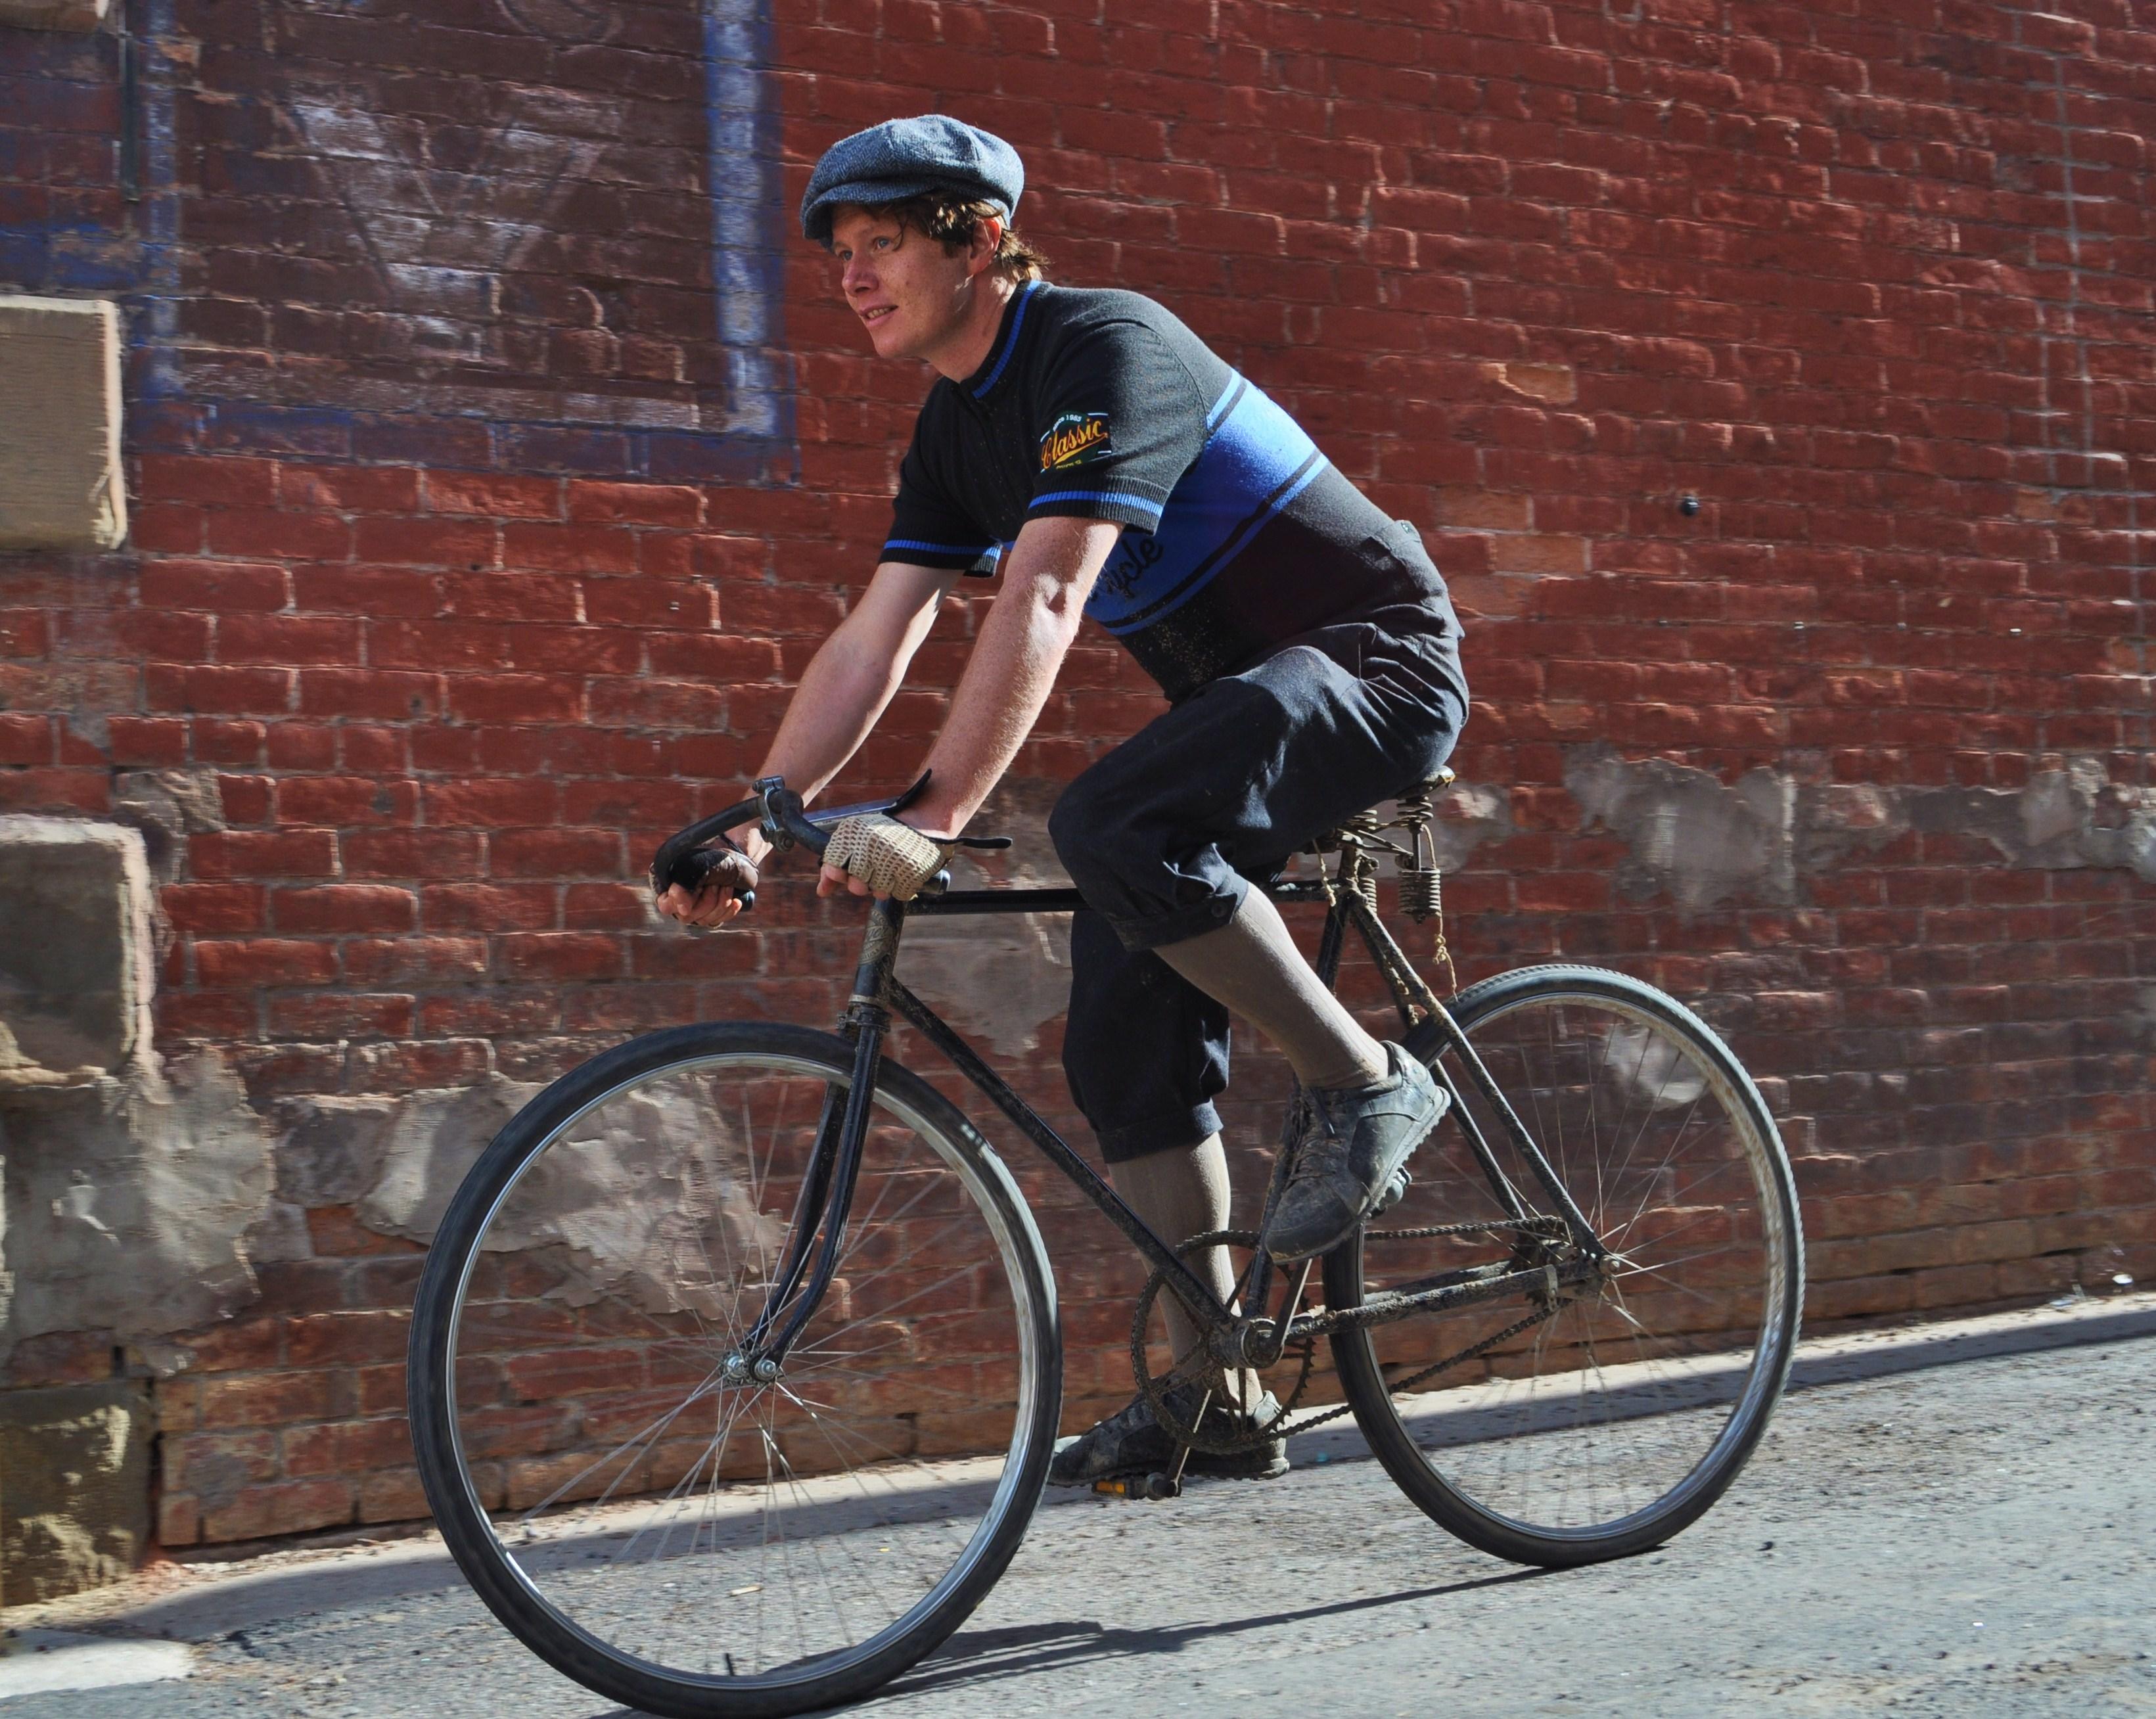 2013 Colorado L Eroica Historic Bike Race Classic Cycle